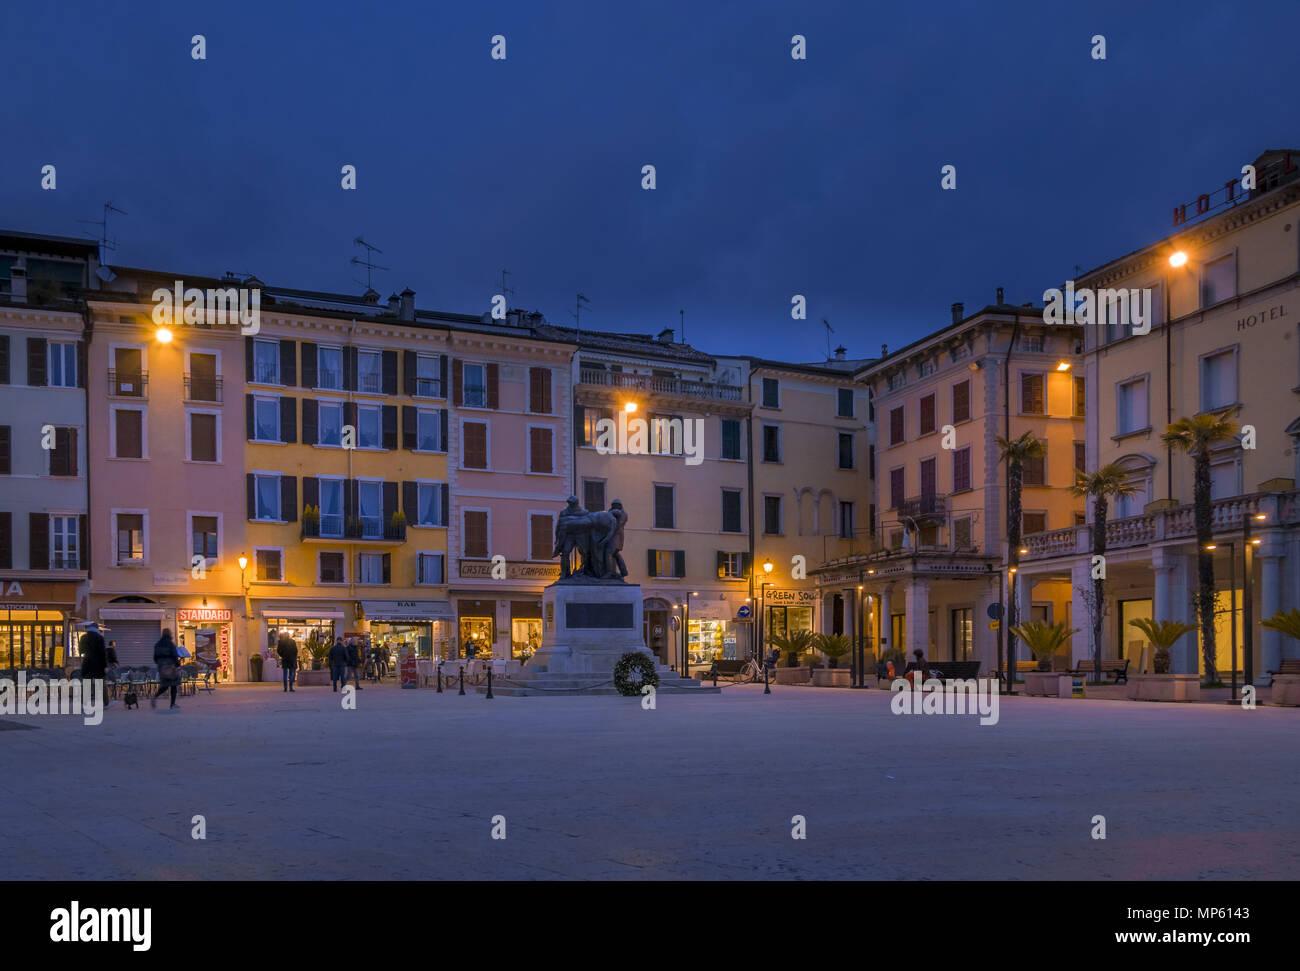 Piazza della Vittoria à Salo, Italie Banque D'Images